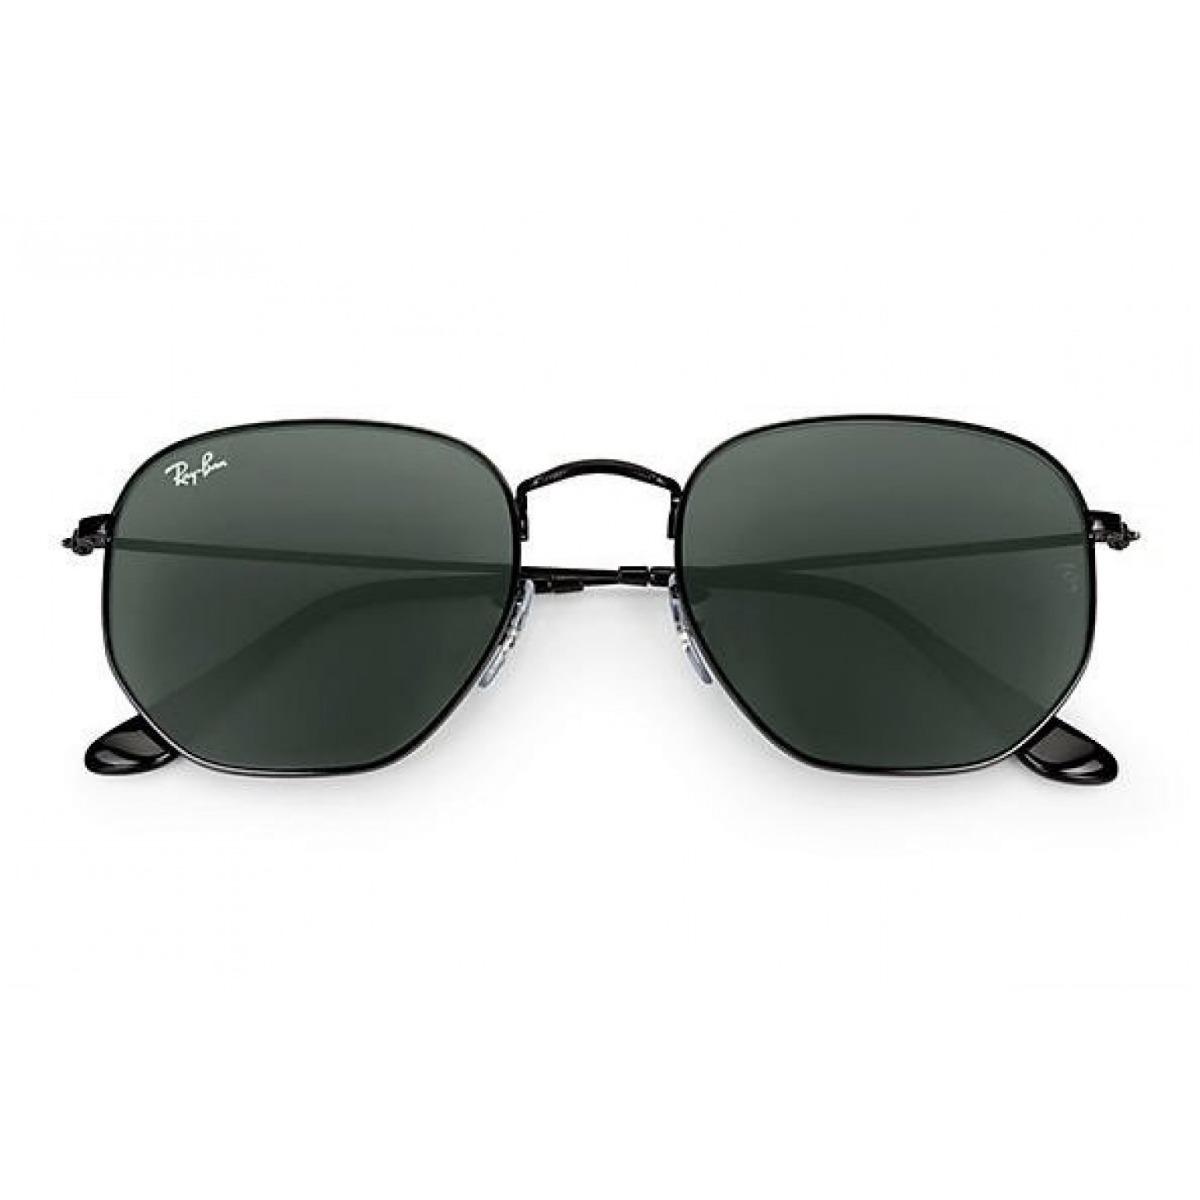 óculos ray ban rb3548 54mm hexagonal masculino feminino. Carregando zoom. 0c8ebe72cb